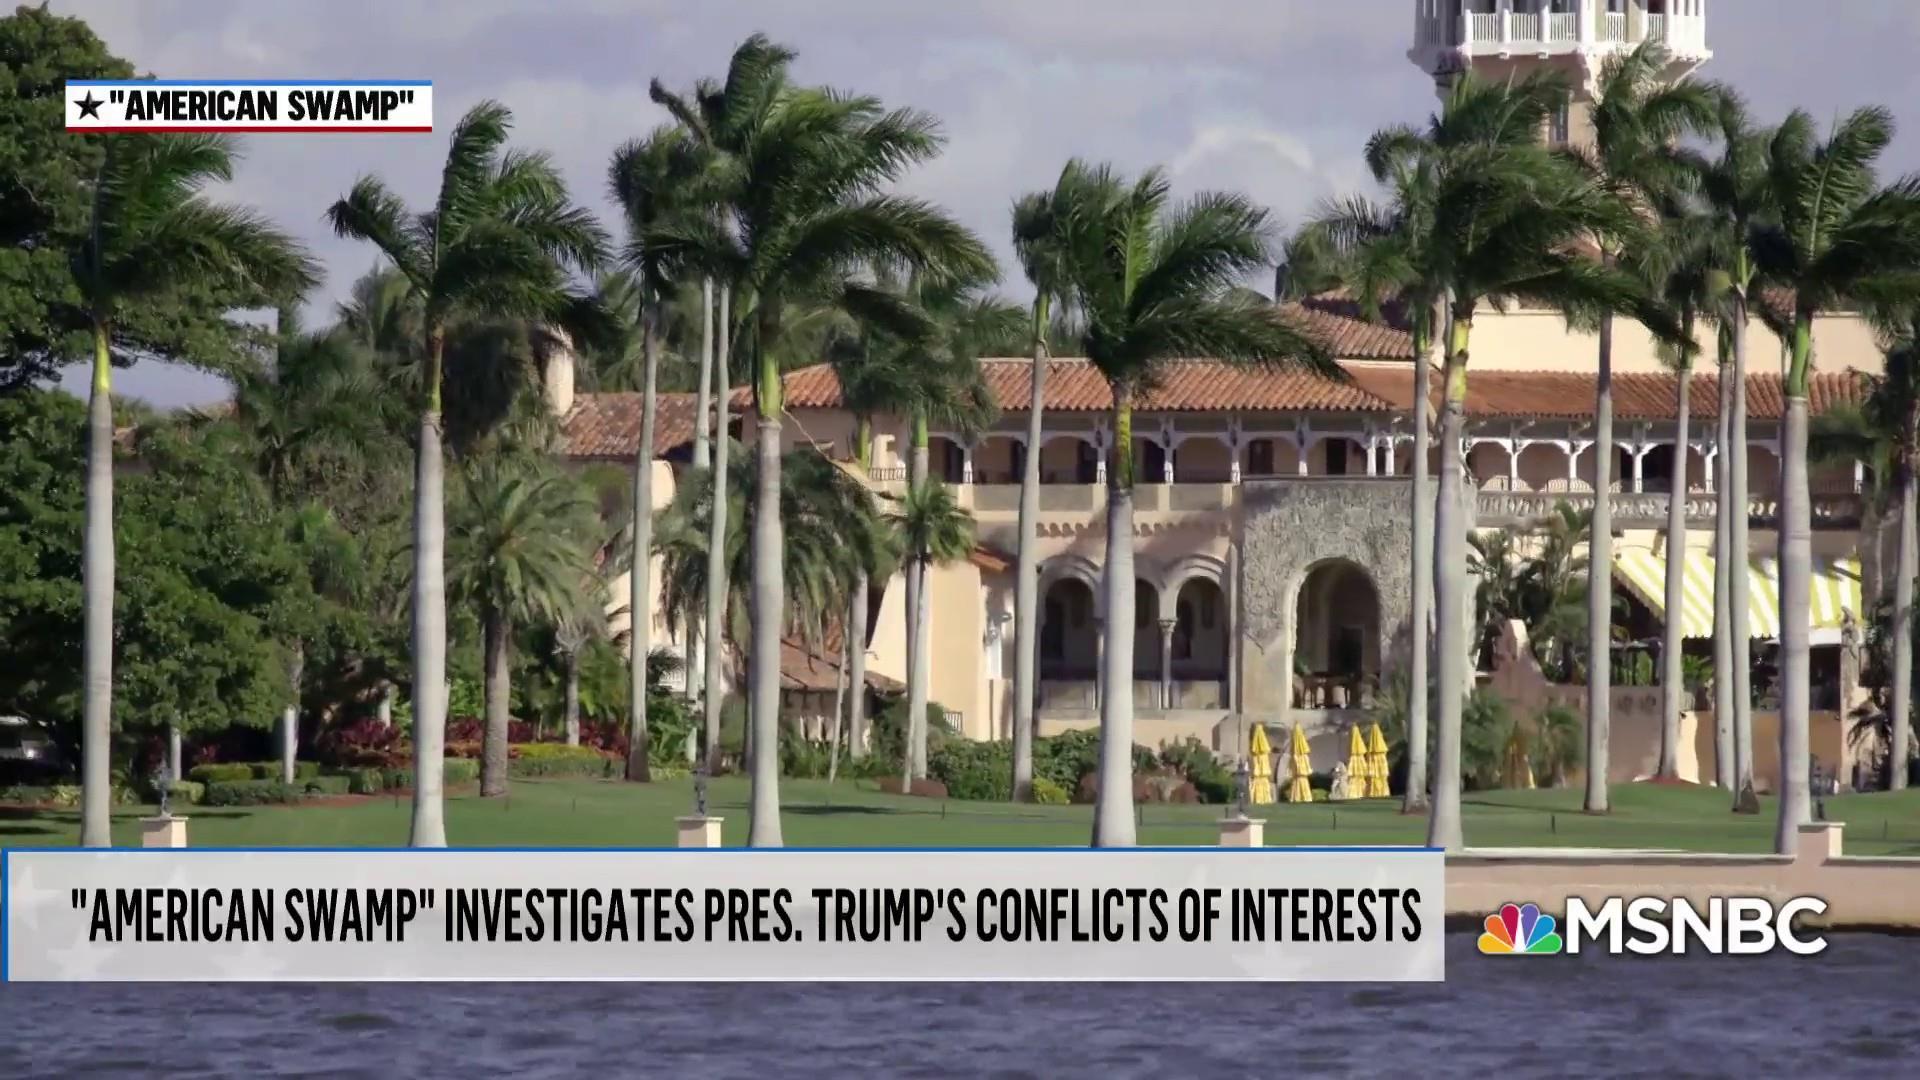 New documentary looks at how Trump exploits presidency for money